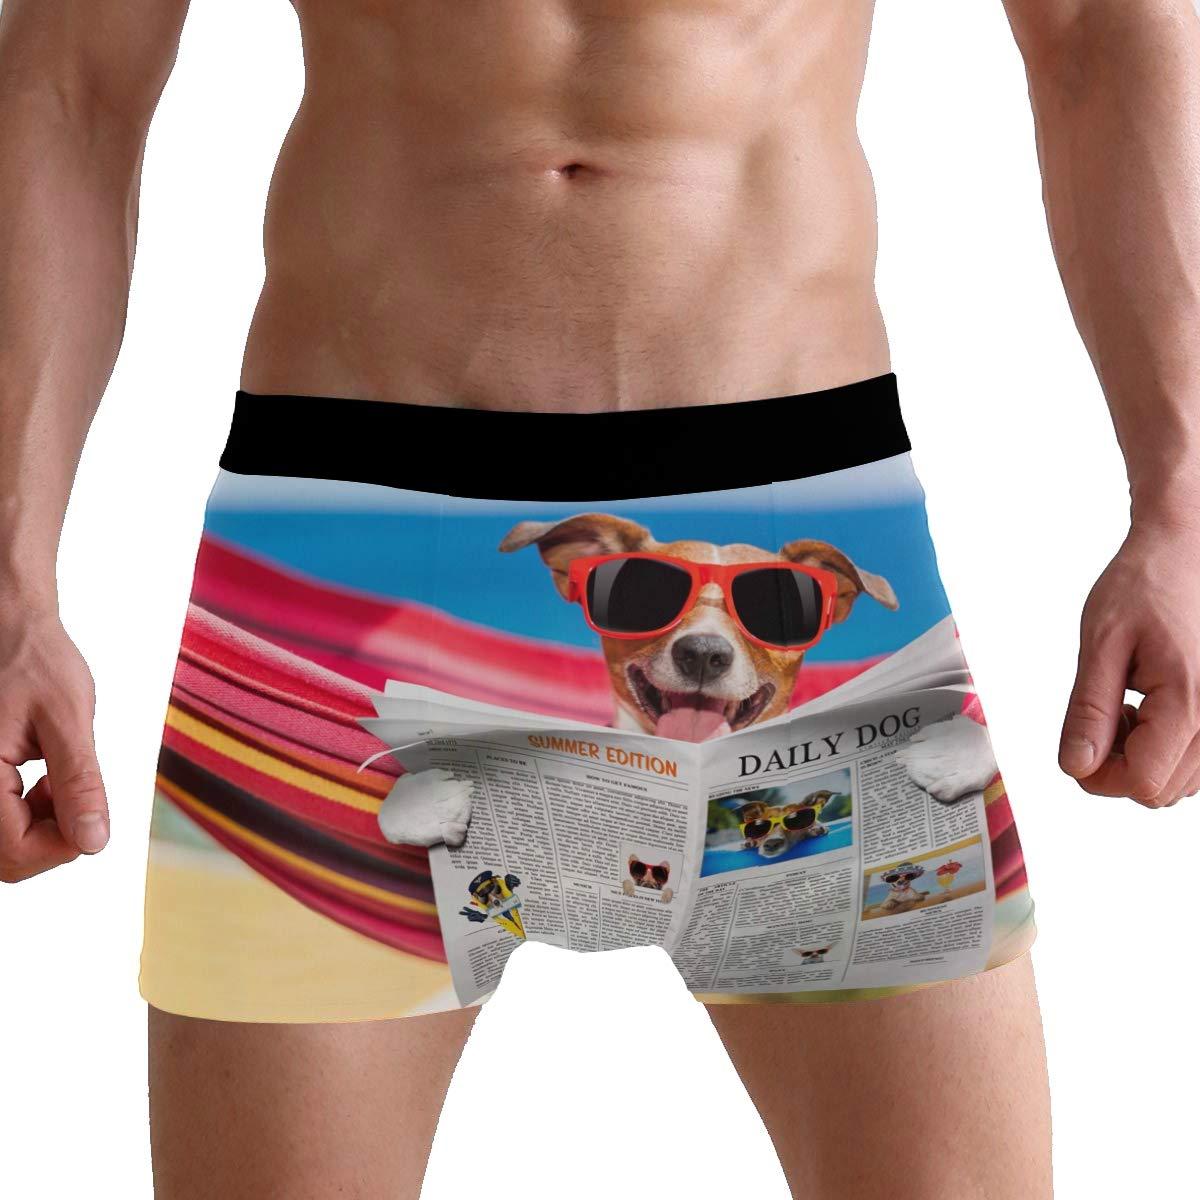 SUABO Mens 2-Pack Boxer Briefs Polyester Underwear Trunk Underwear with Dog Reading Newspaper Design